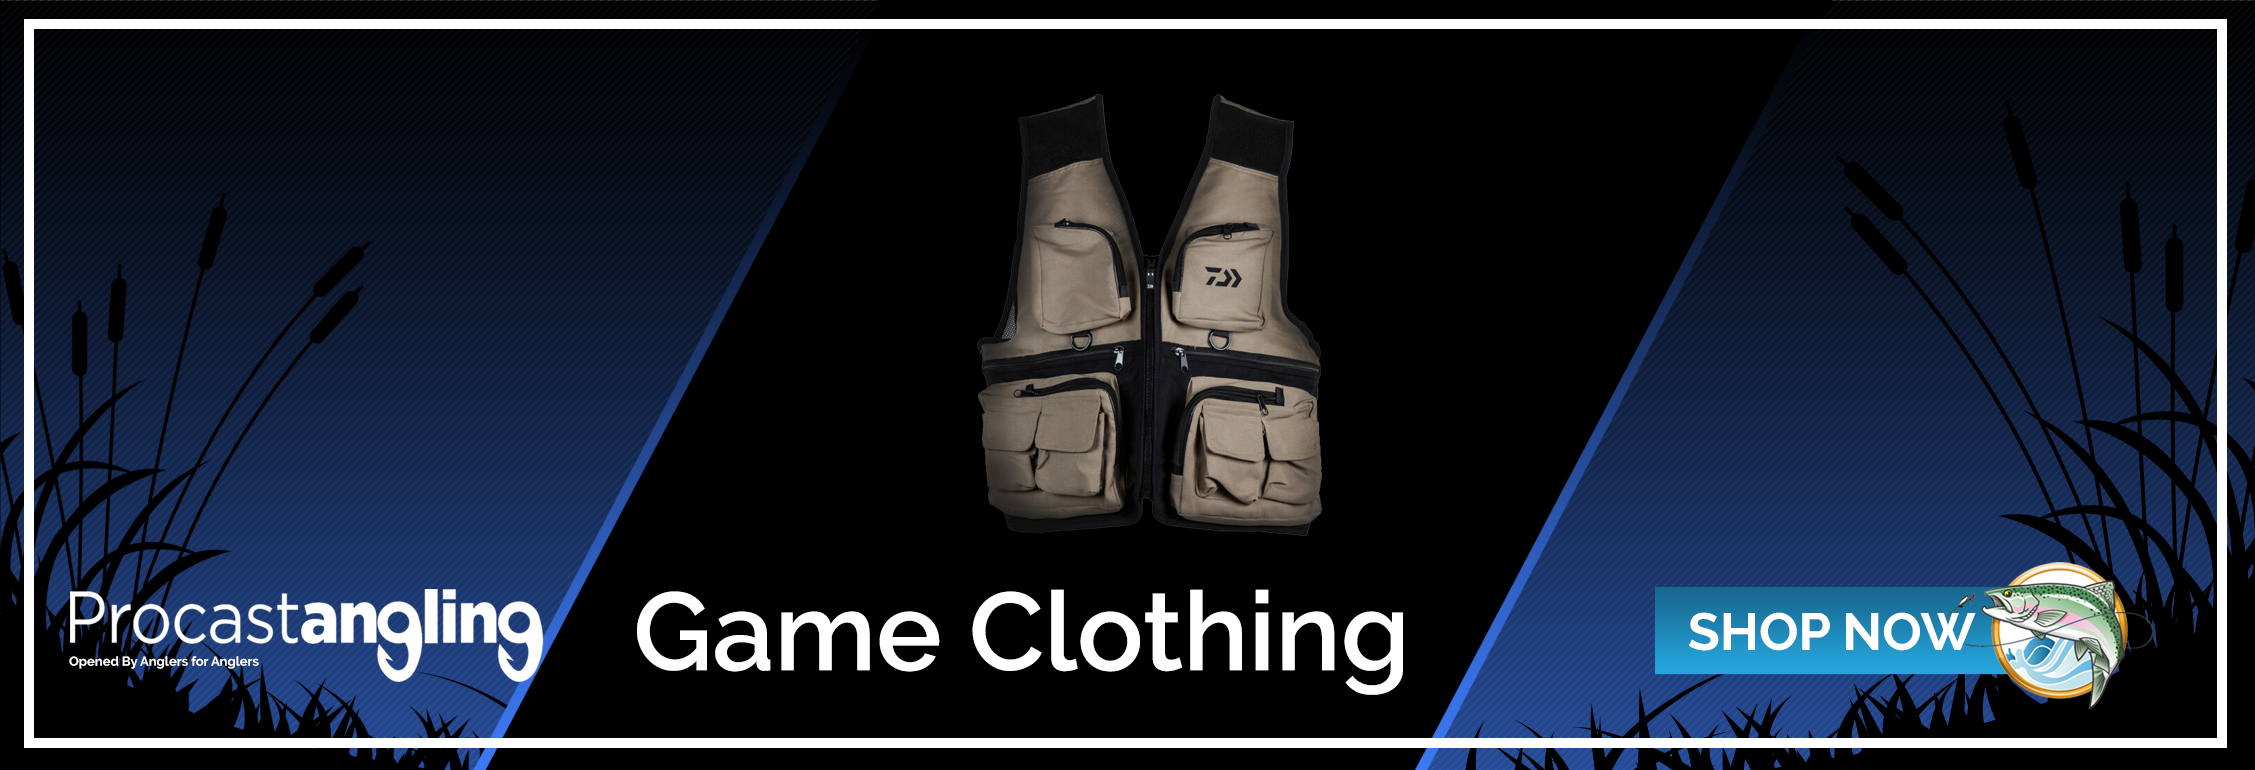 GAME CLOTHING